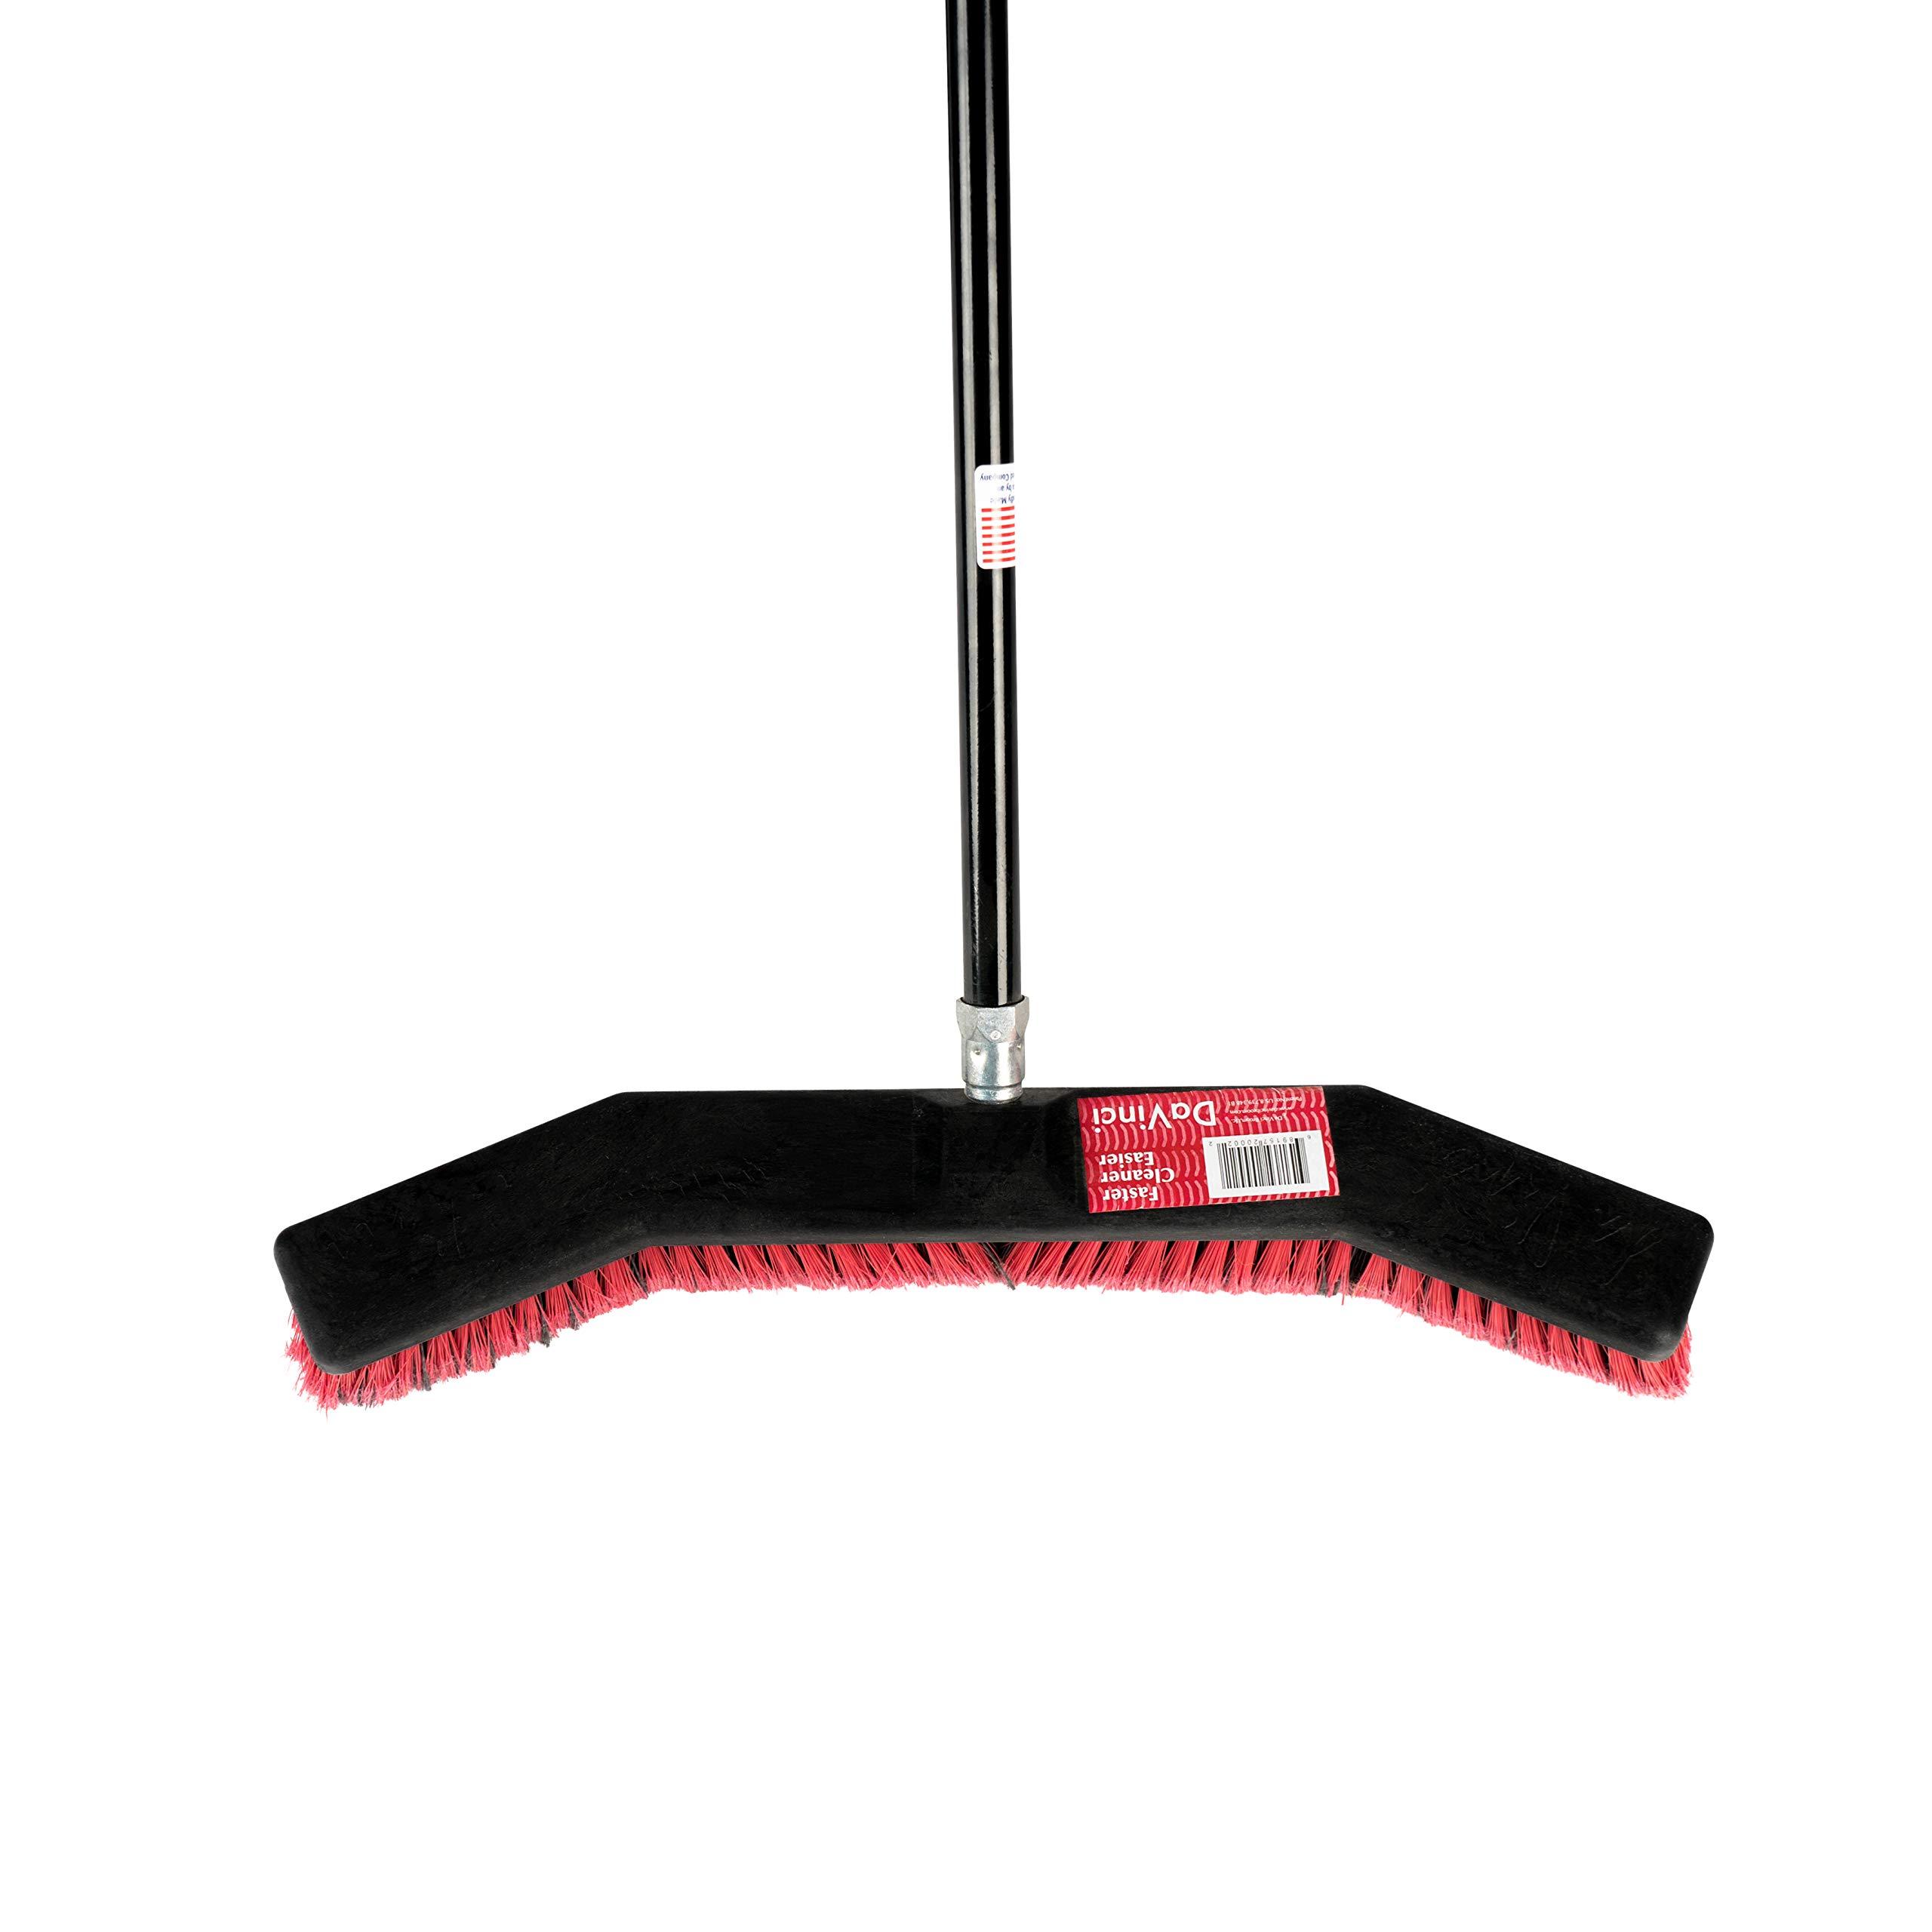 ROOT ASSASSIN Shop Broom/Push Broom, Keeps Debris Inside Broom, Best for Sweeping Kitchen Floors, Patios, Garages, Shops, Tile, Large Areas, and Wood Floors. Durable, Large, Light (Shop Broom) by ROOT ASSASSIN